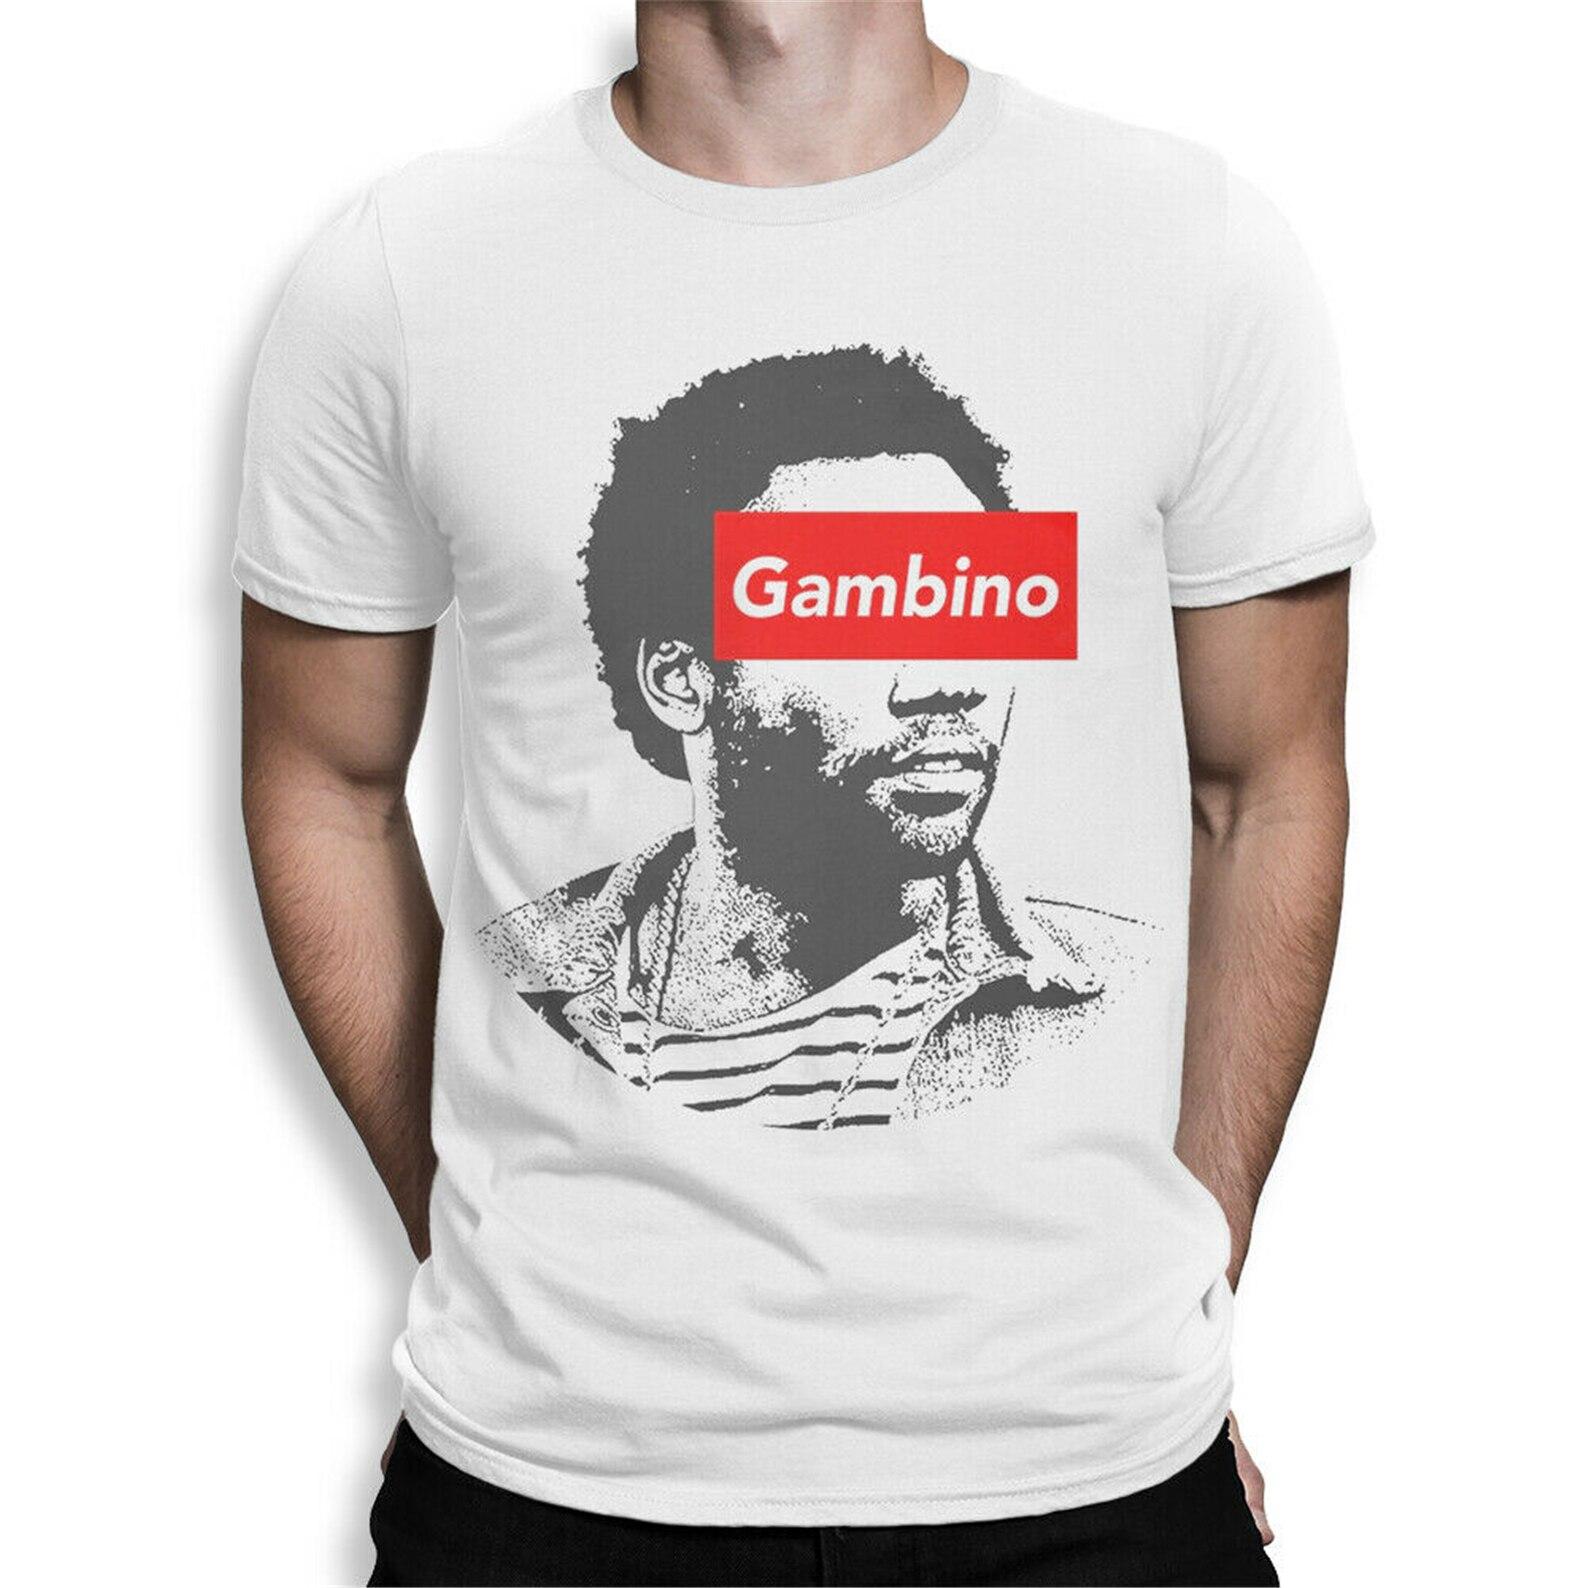 Camiseta infantil de Gambino, camiseta de Rap Donald Glover, camisetas harajuku para hombres, camiseta